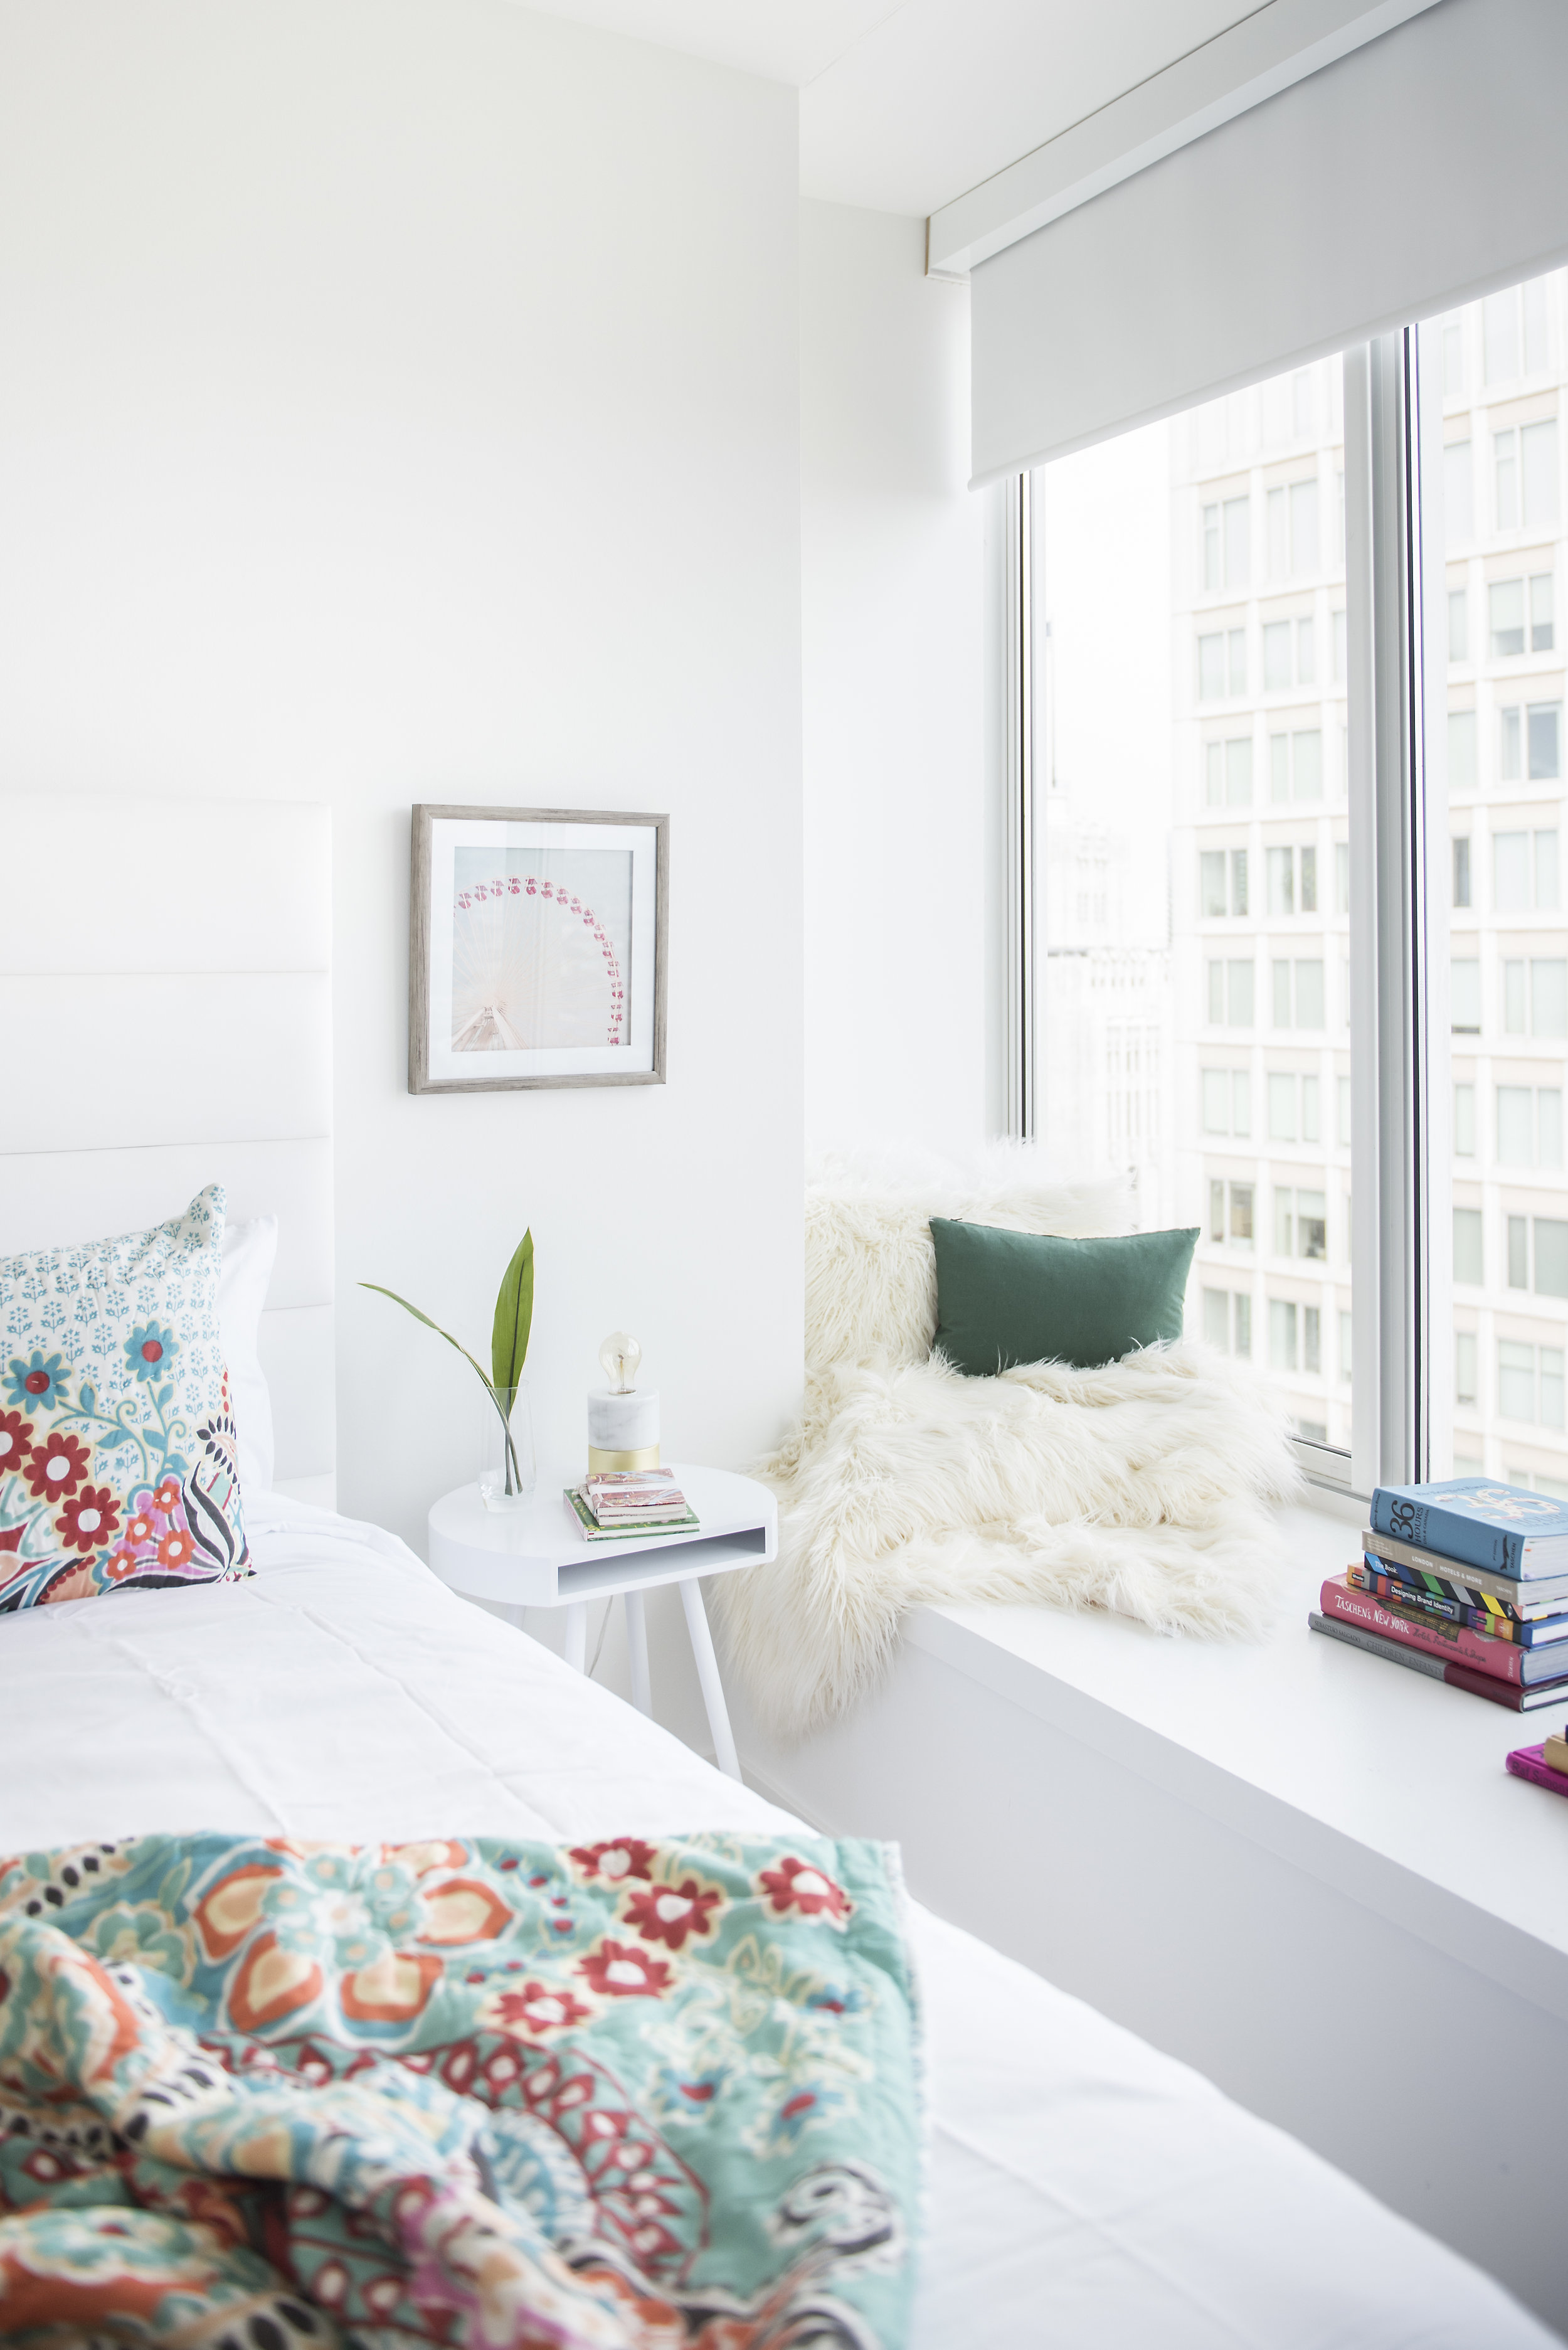 JuliaSperling_Houzz_San Francisco_Apartment_03.jpg